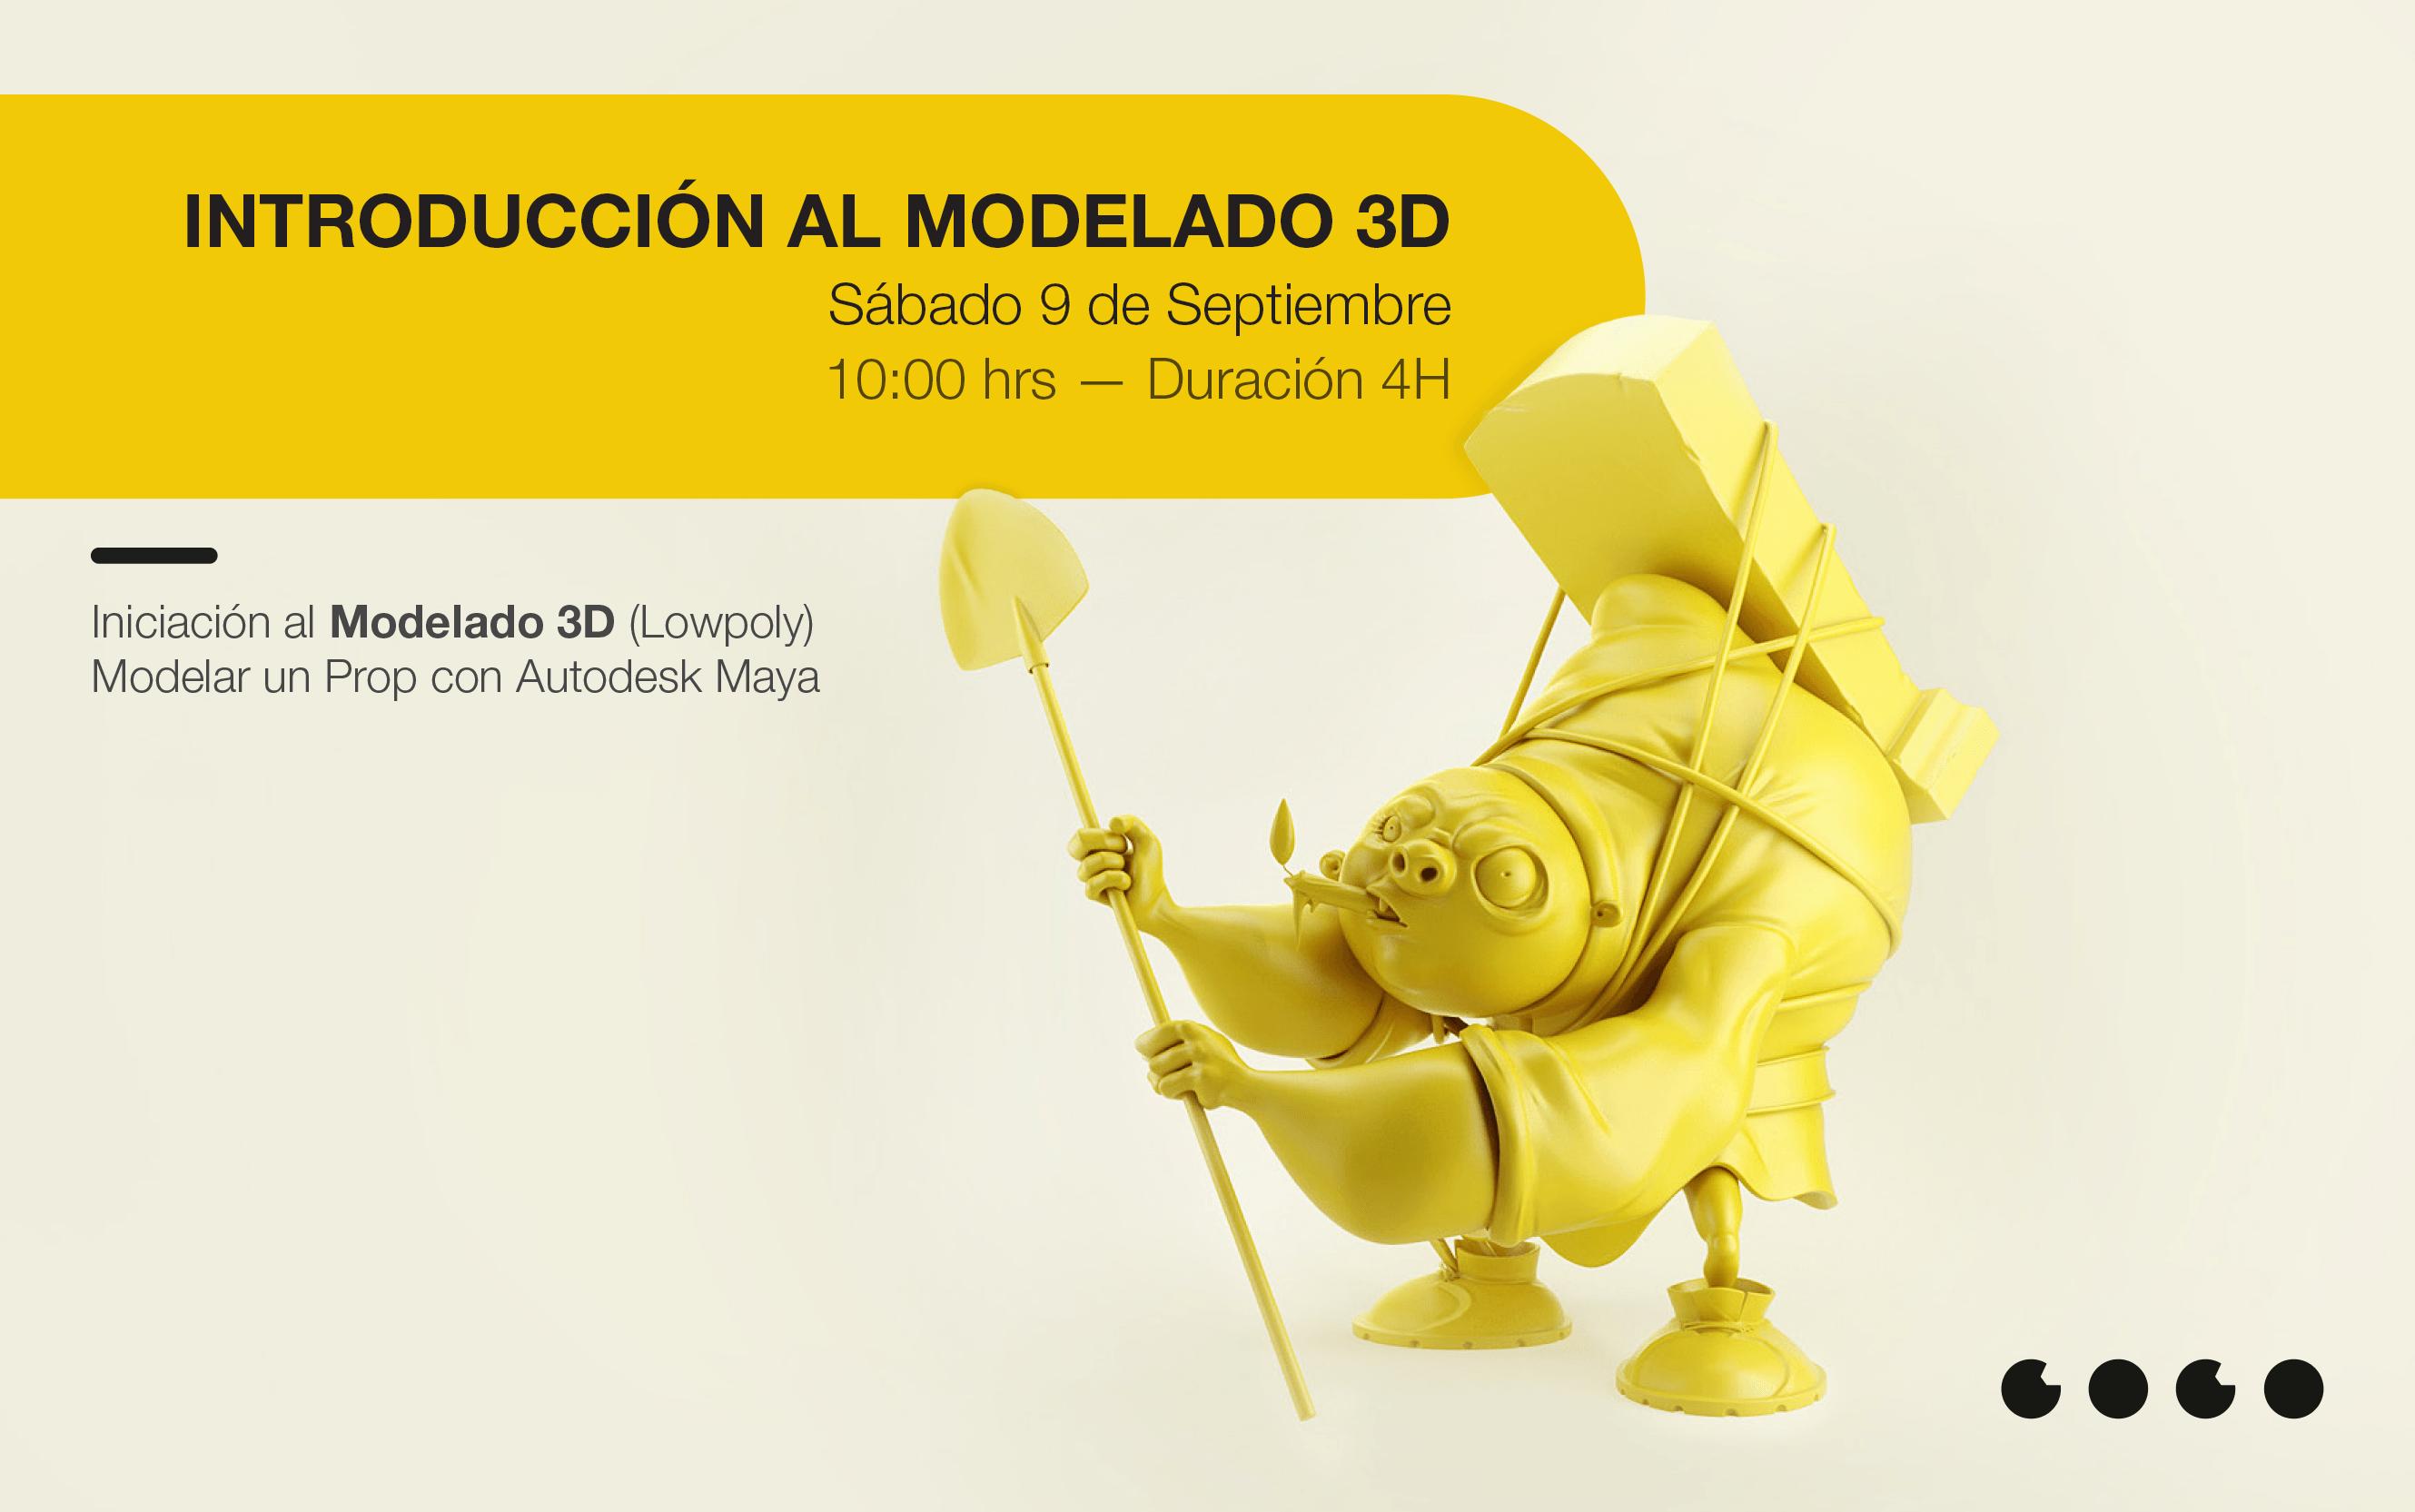 Introduccion al Modelado 3D Workshop